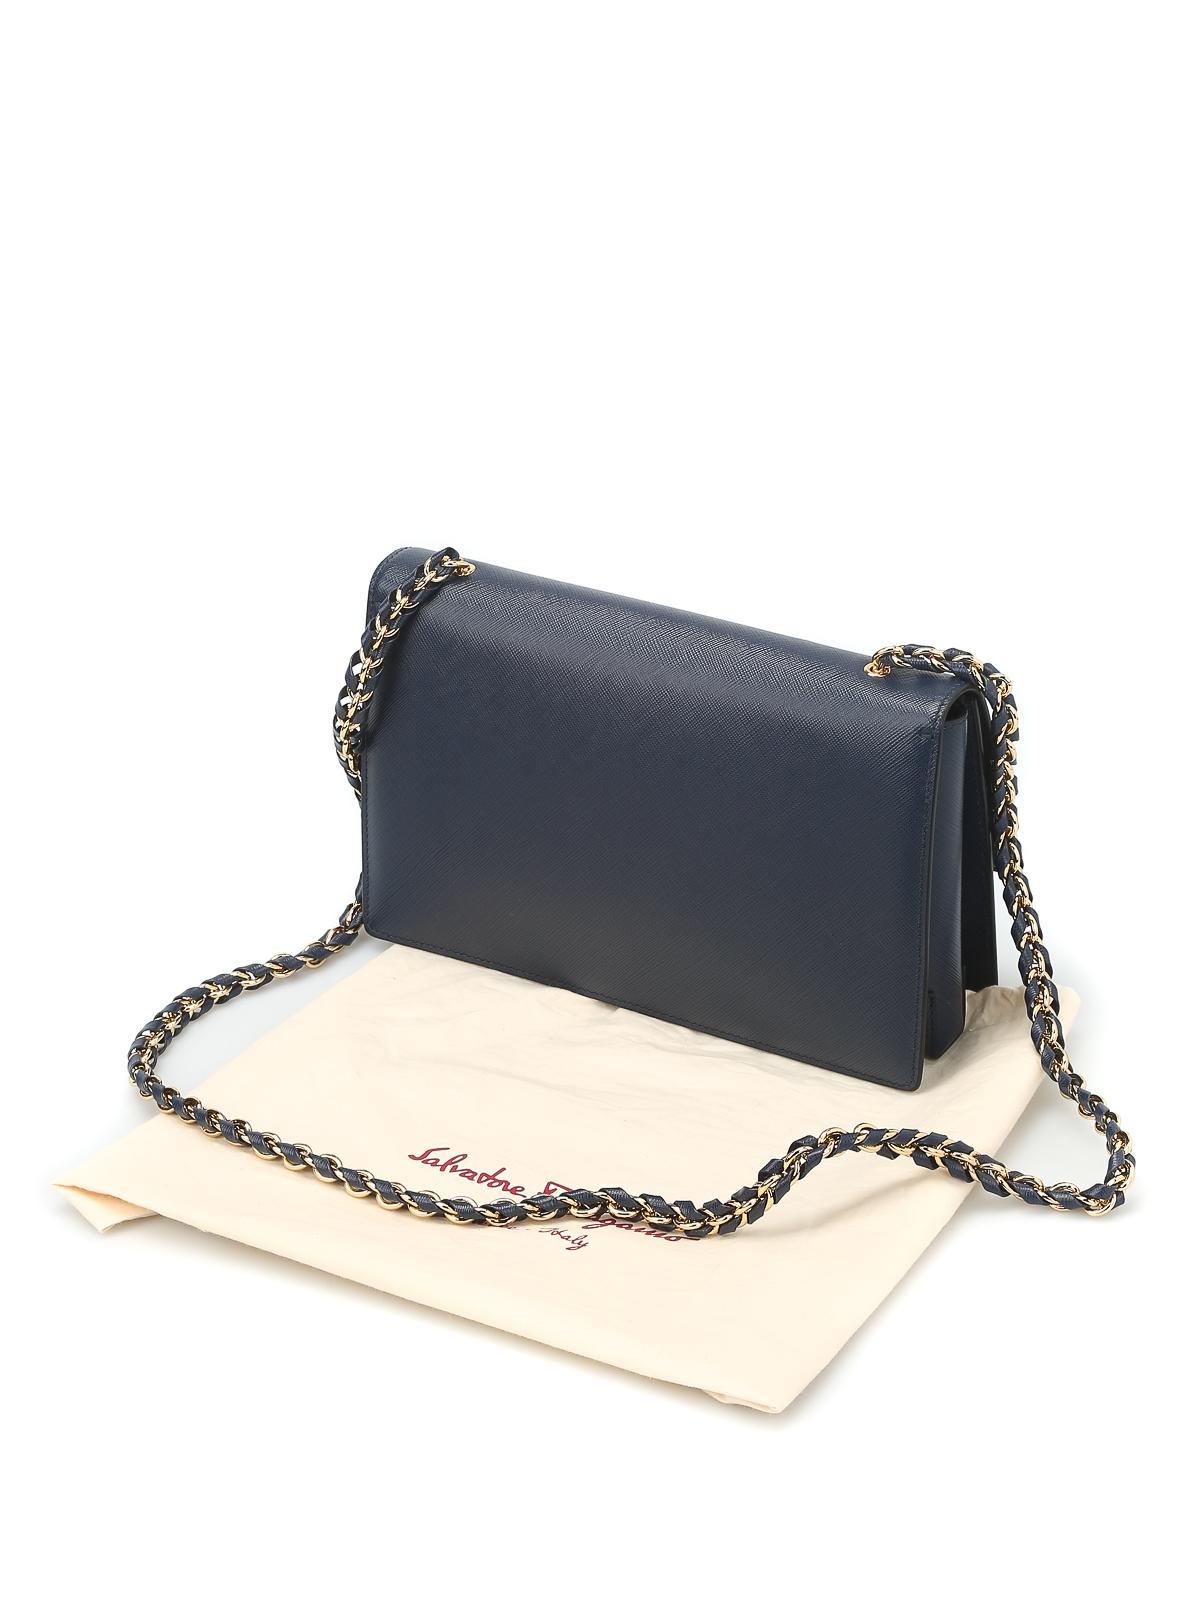 vara bow detail saffiano bag by salvatore ferragamo cross body bags shop online at. Black Bedroom Furniture Sets. Home Design Ideas